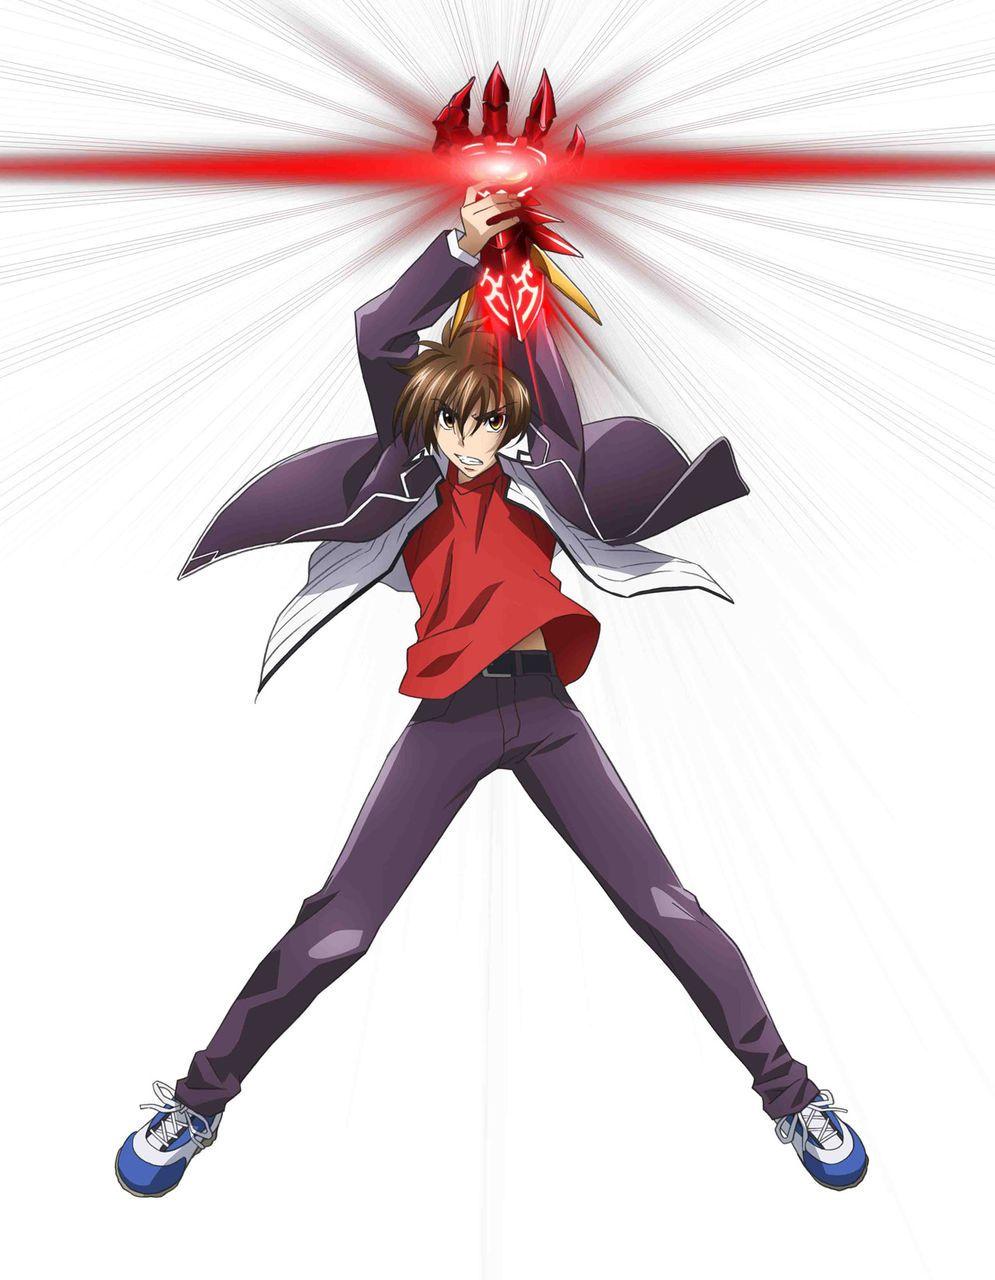 1d369a9a.jpg (995×1280) (With images) Dxd, Anime high